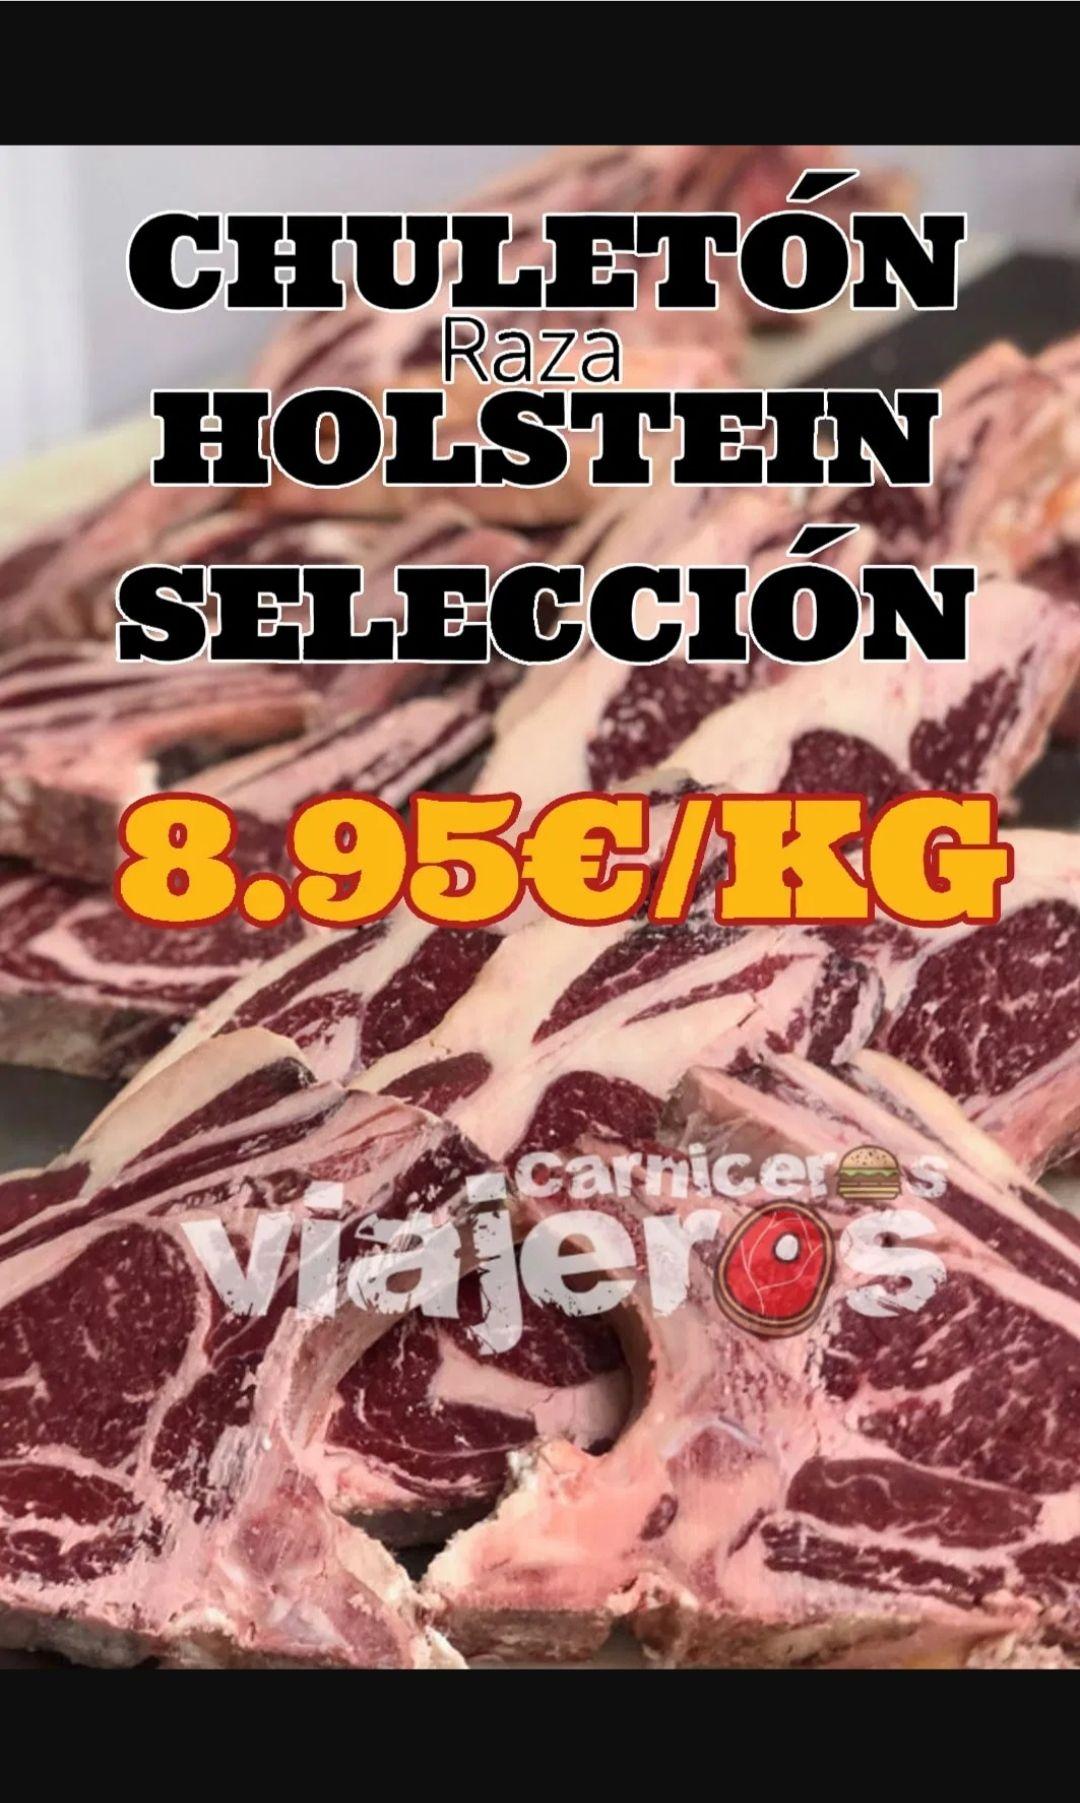 Chuletón vaca holstein del Pirineo + vino Care